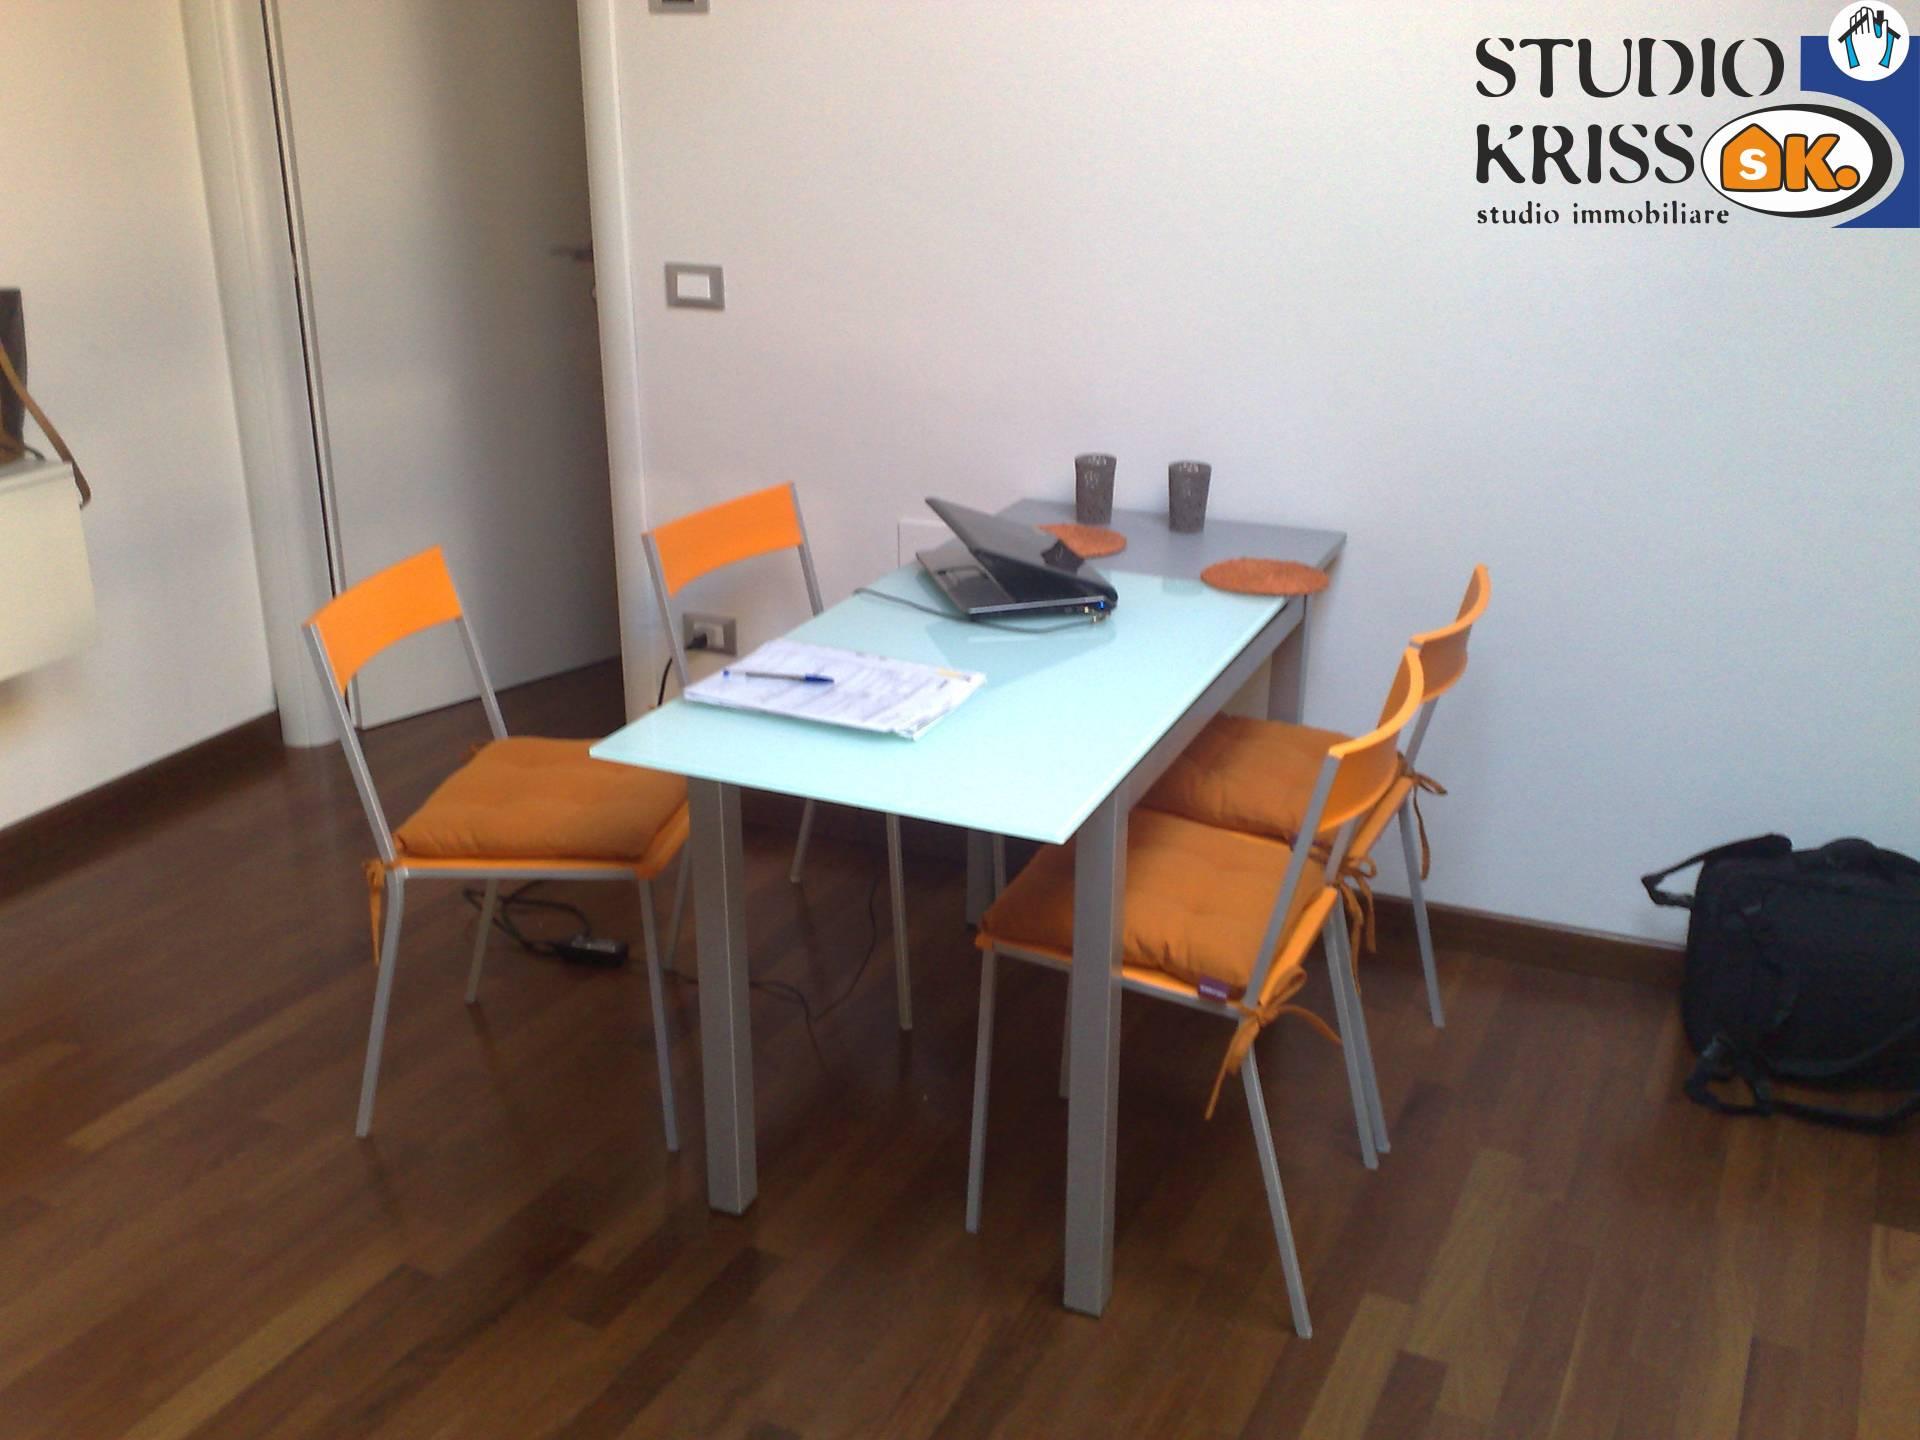 Appartamento in Vendita a Ferrara: 2 locali, 60 mq - Foto 3